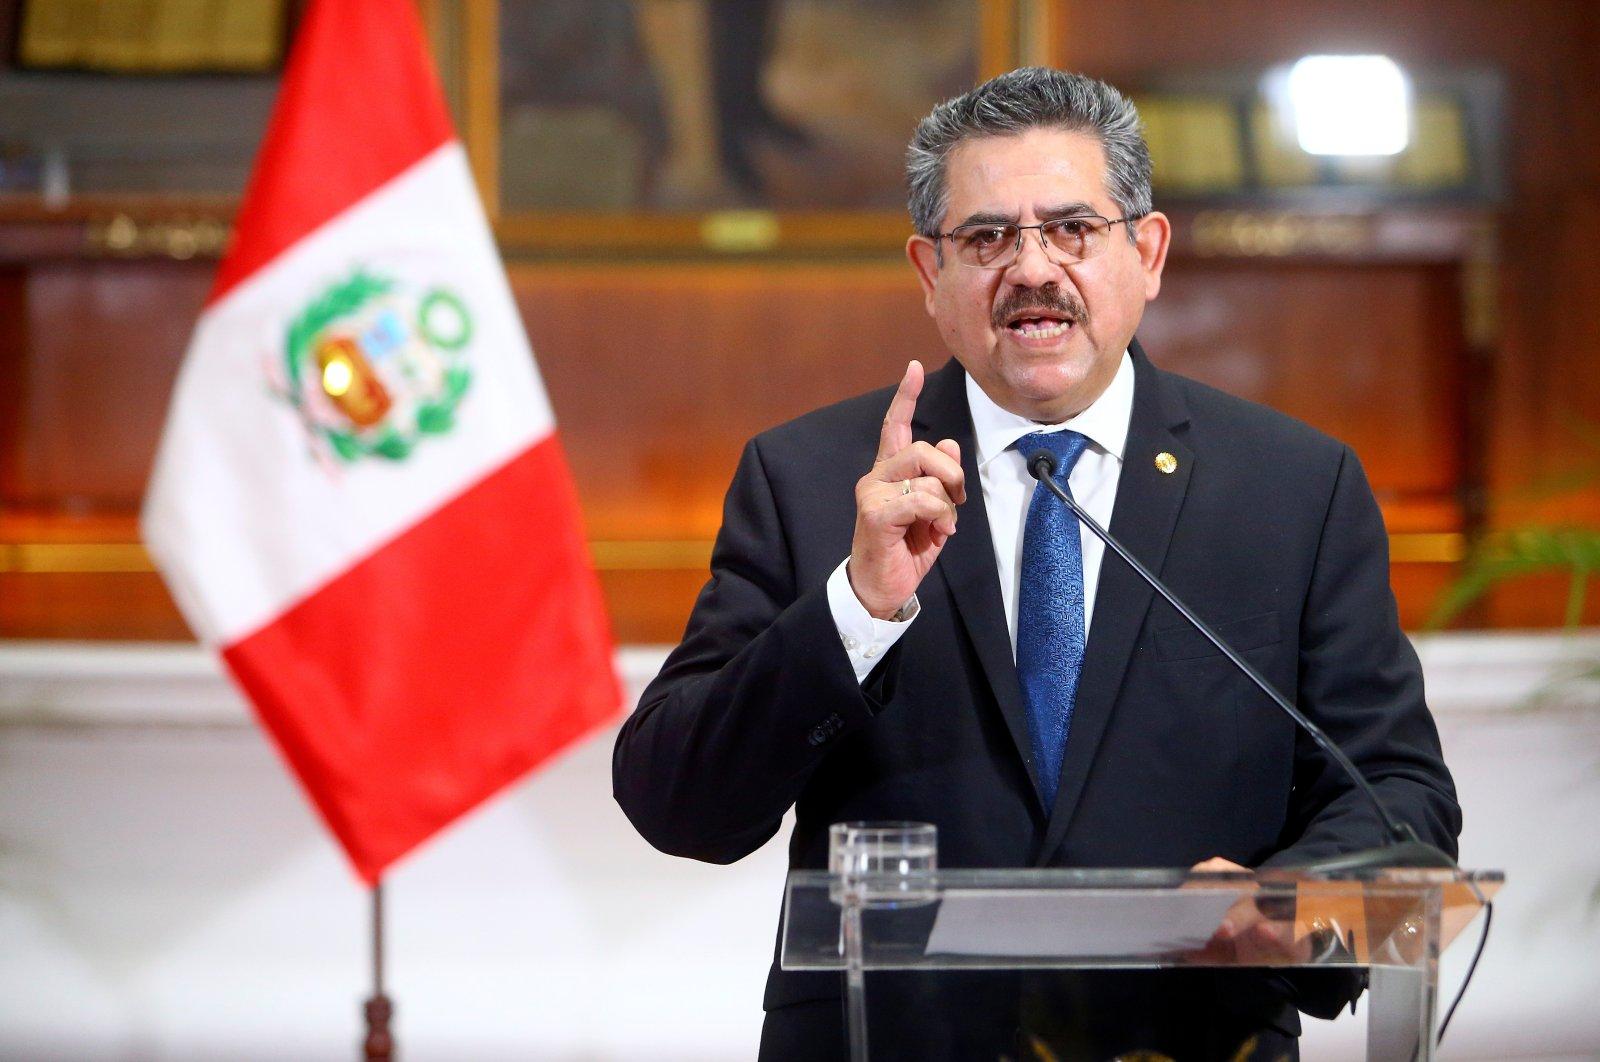 Peru's interim President Manuel Merino announces his resignation in a televised address, in Lima, Peru, Nov. 15, 2020. (Reuters Photo)